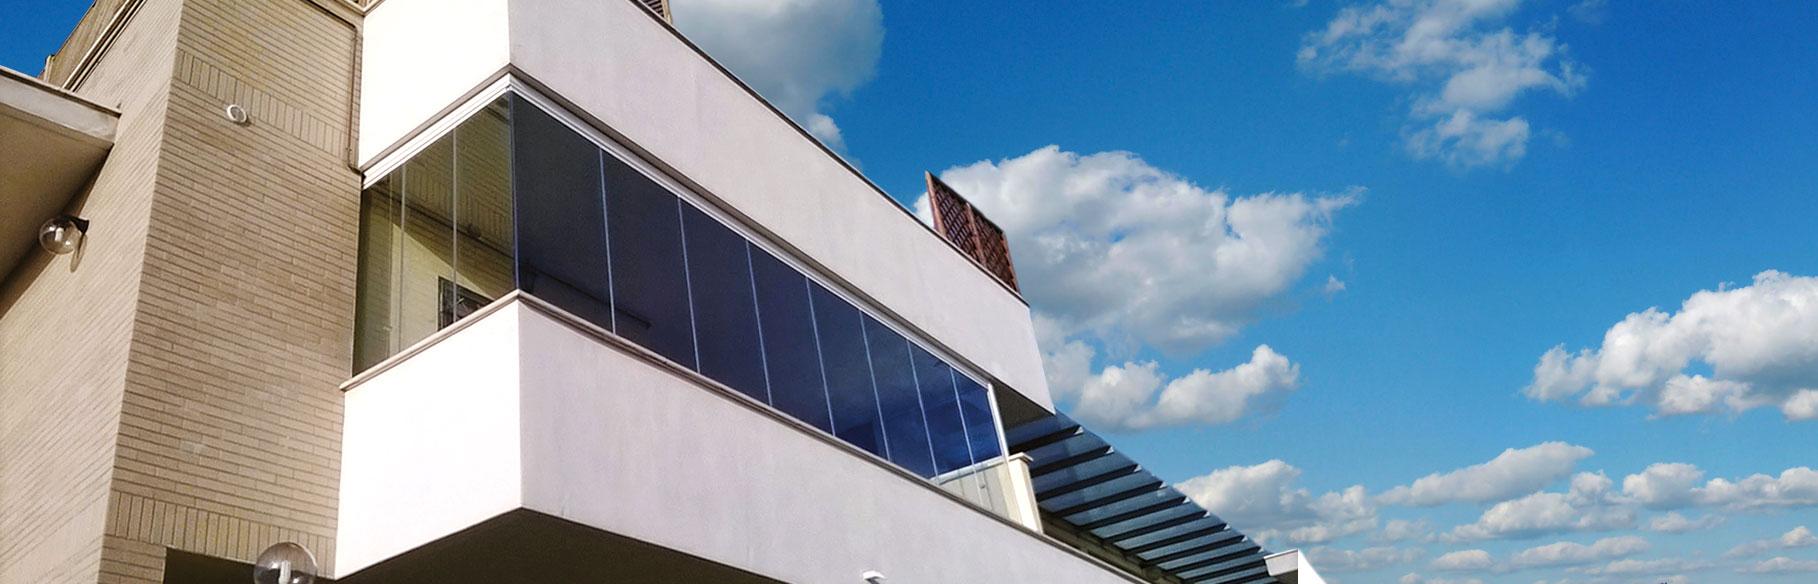 Pareti in vetro e vetrate scorrevoli - TSH Service